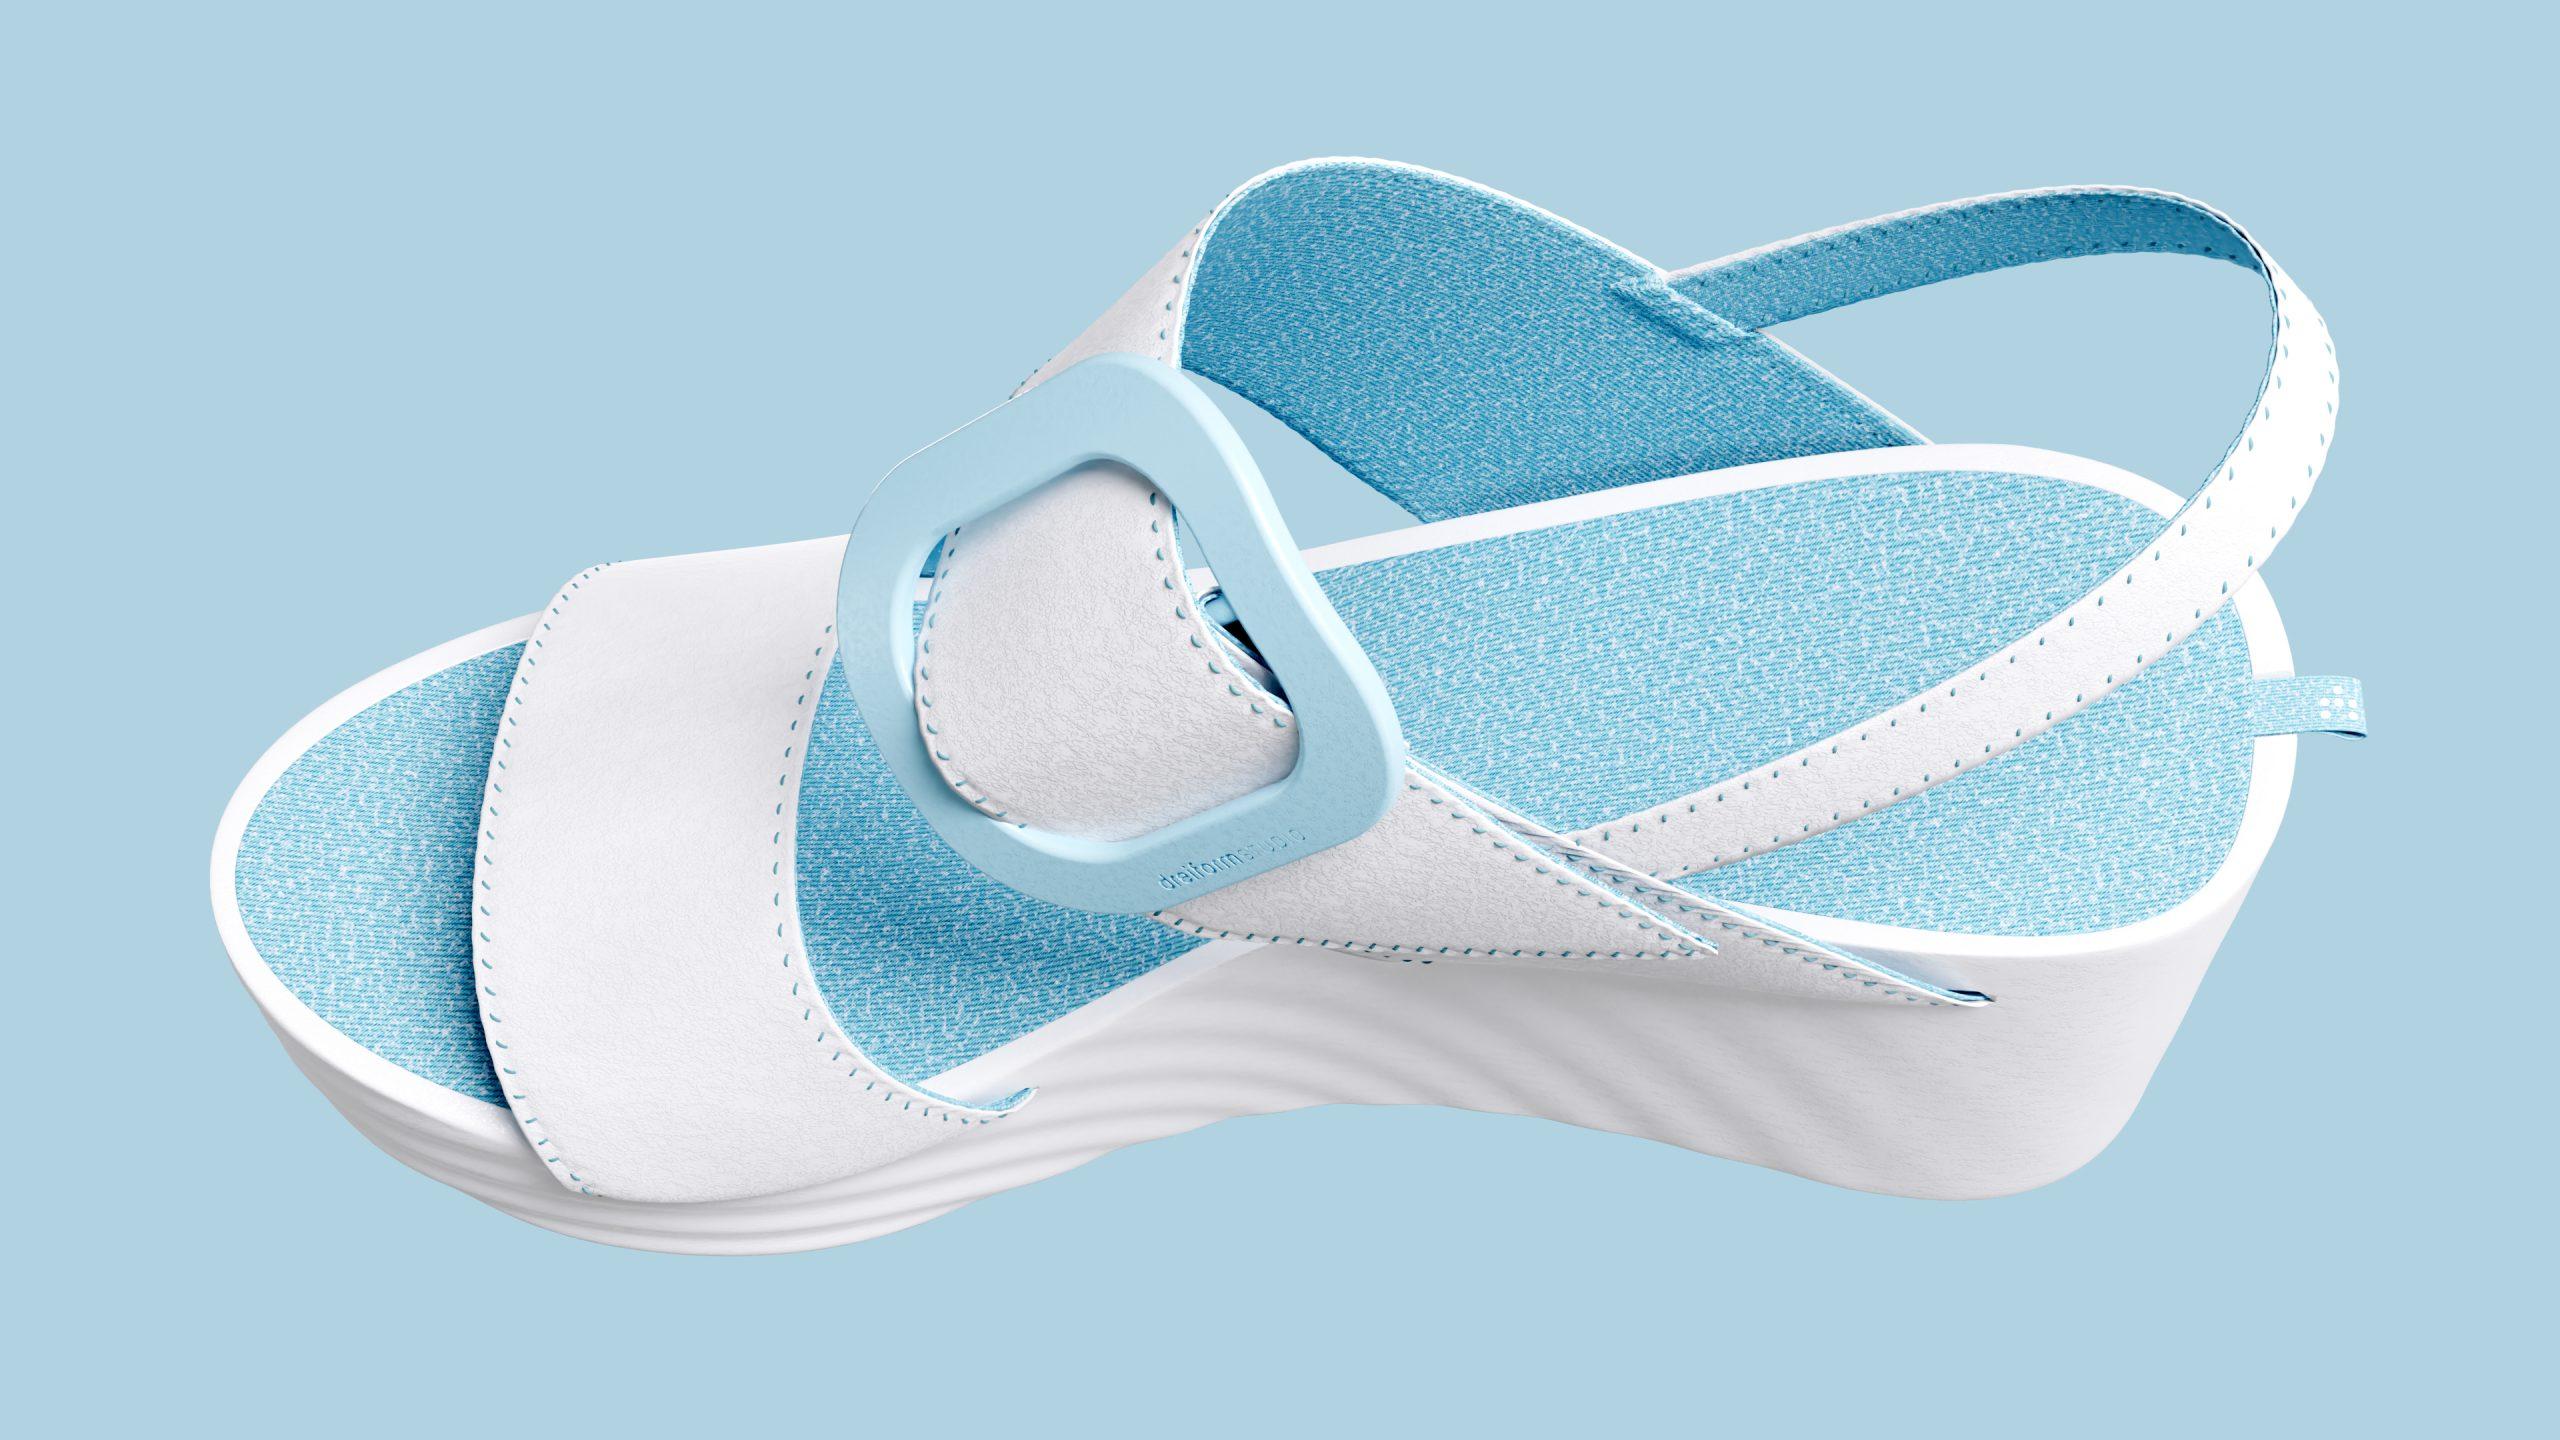 dreiformstudio white concept wedge sandals on blue background, view perspective